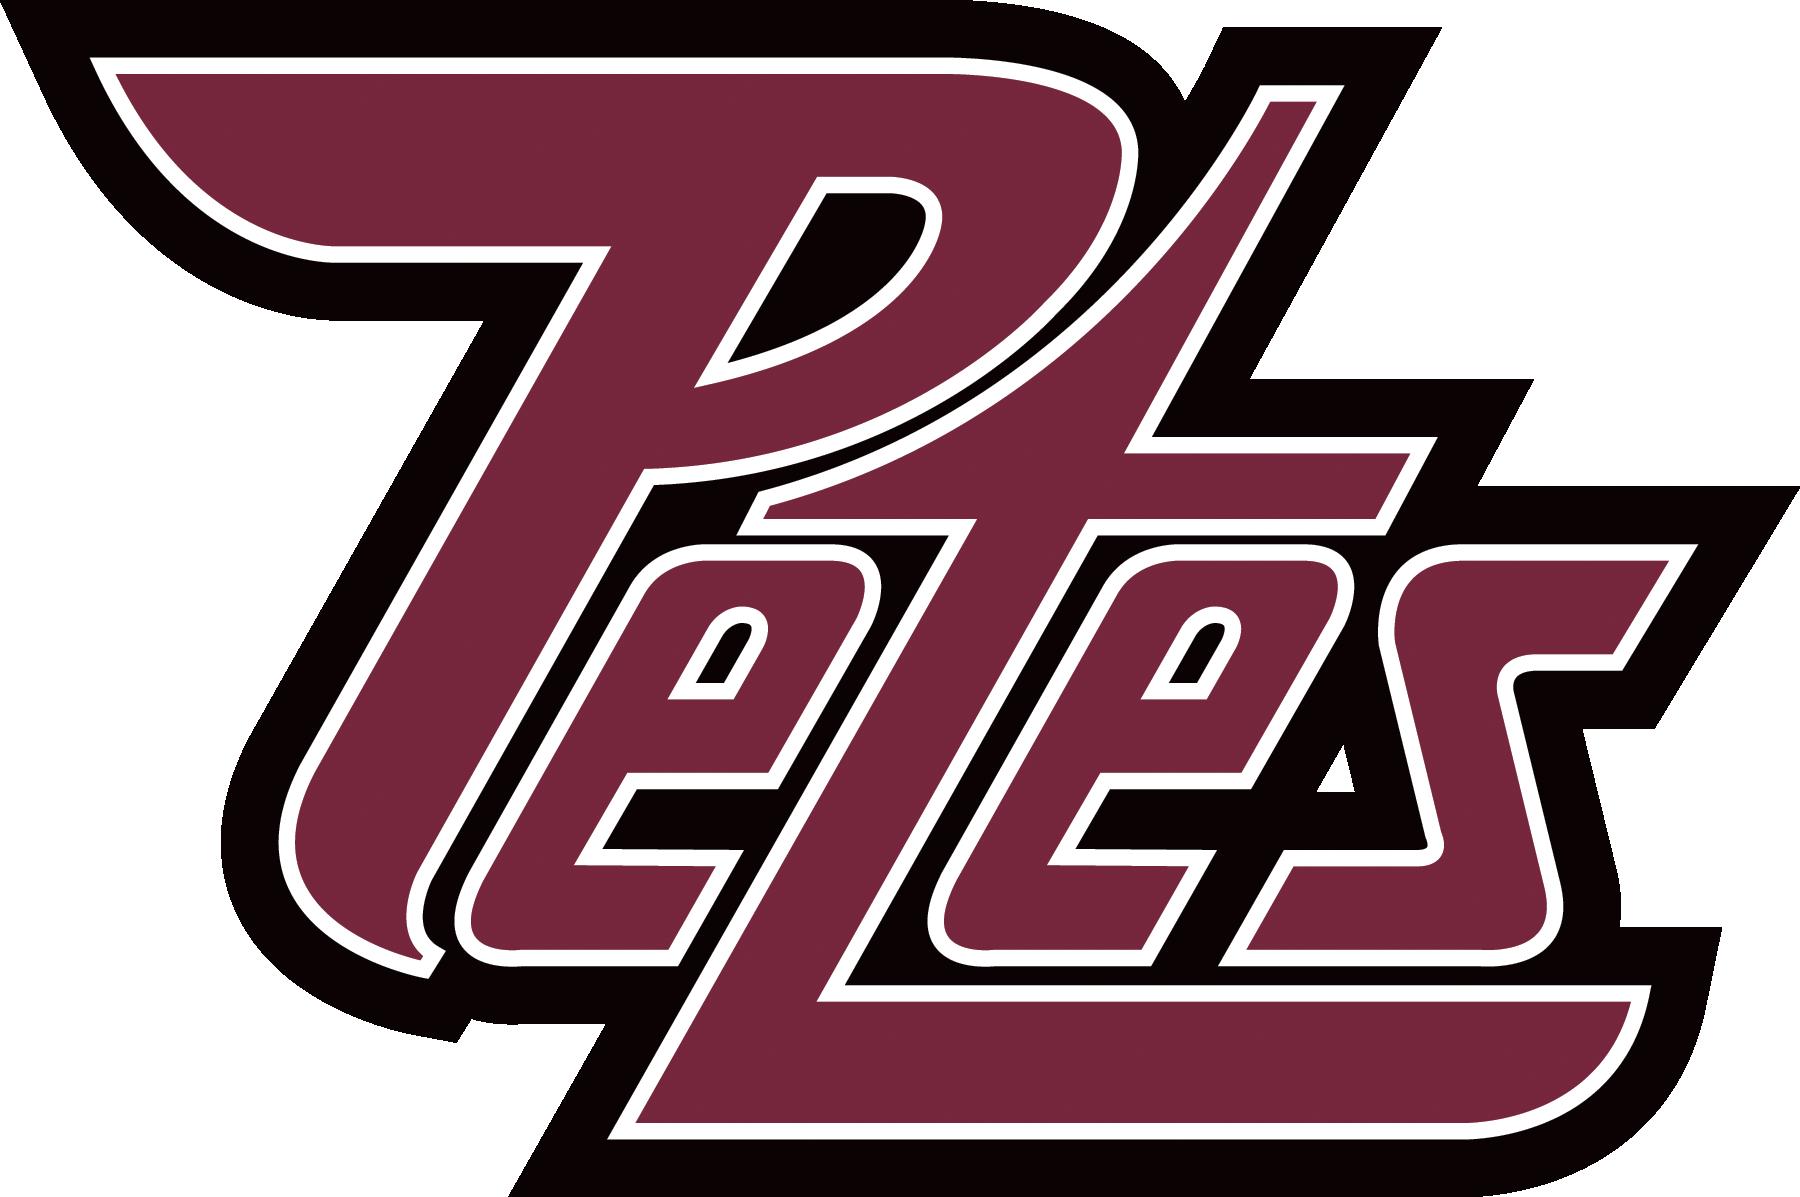 Peterborough Petes logo